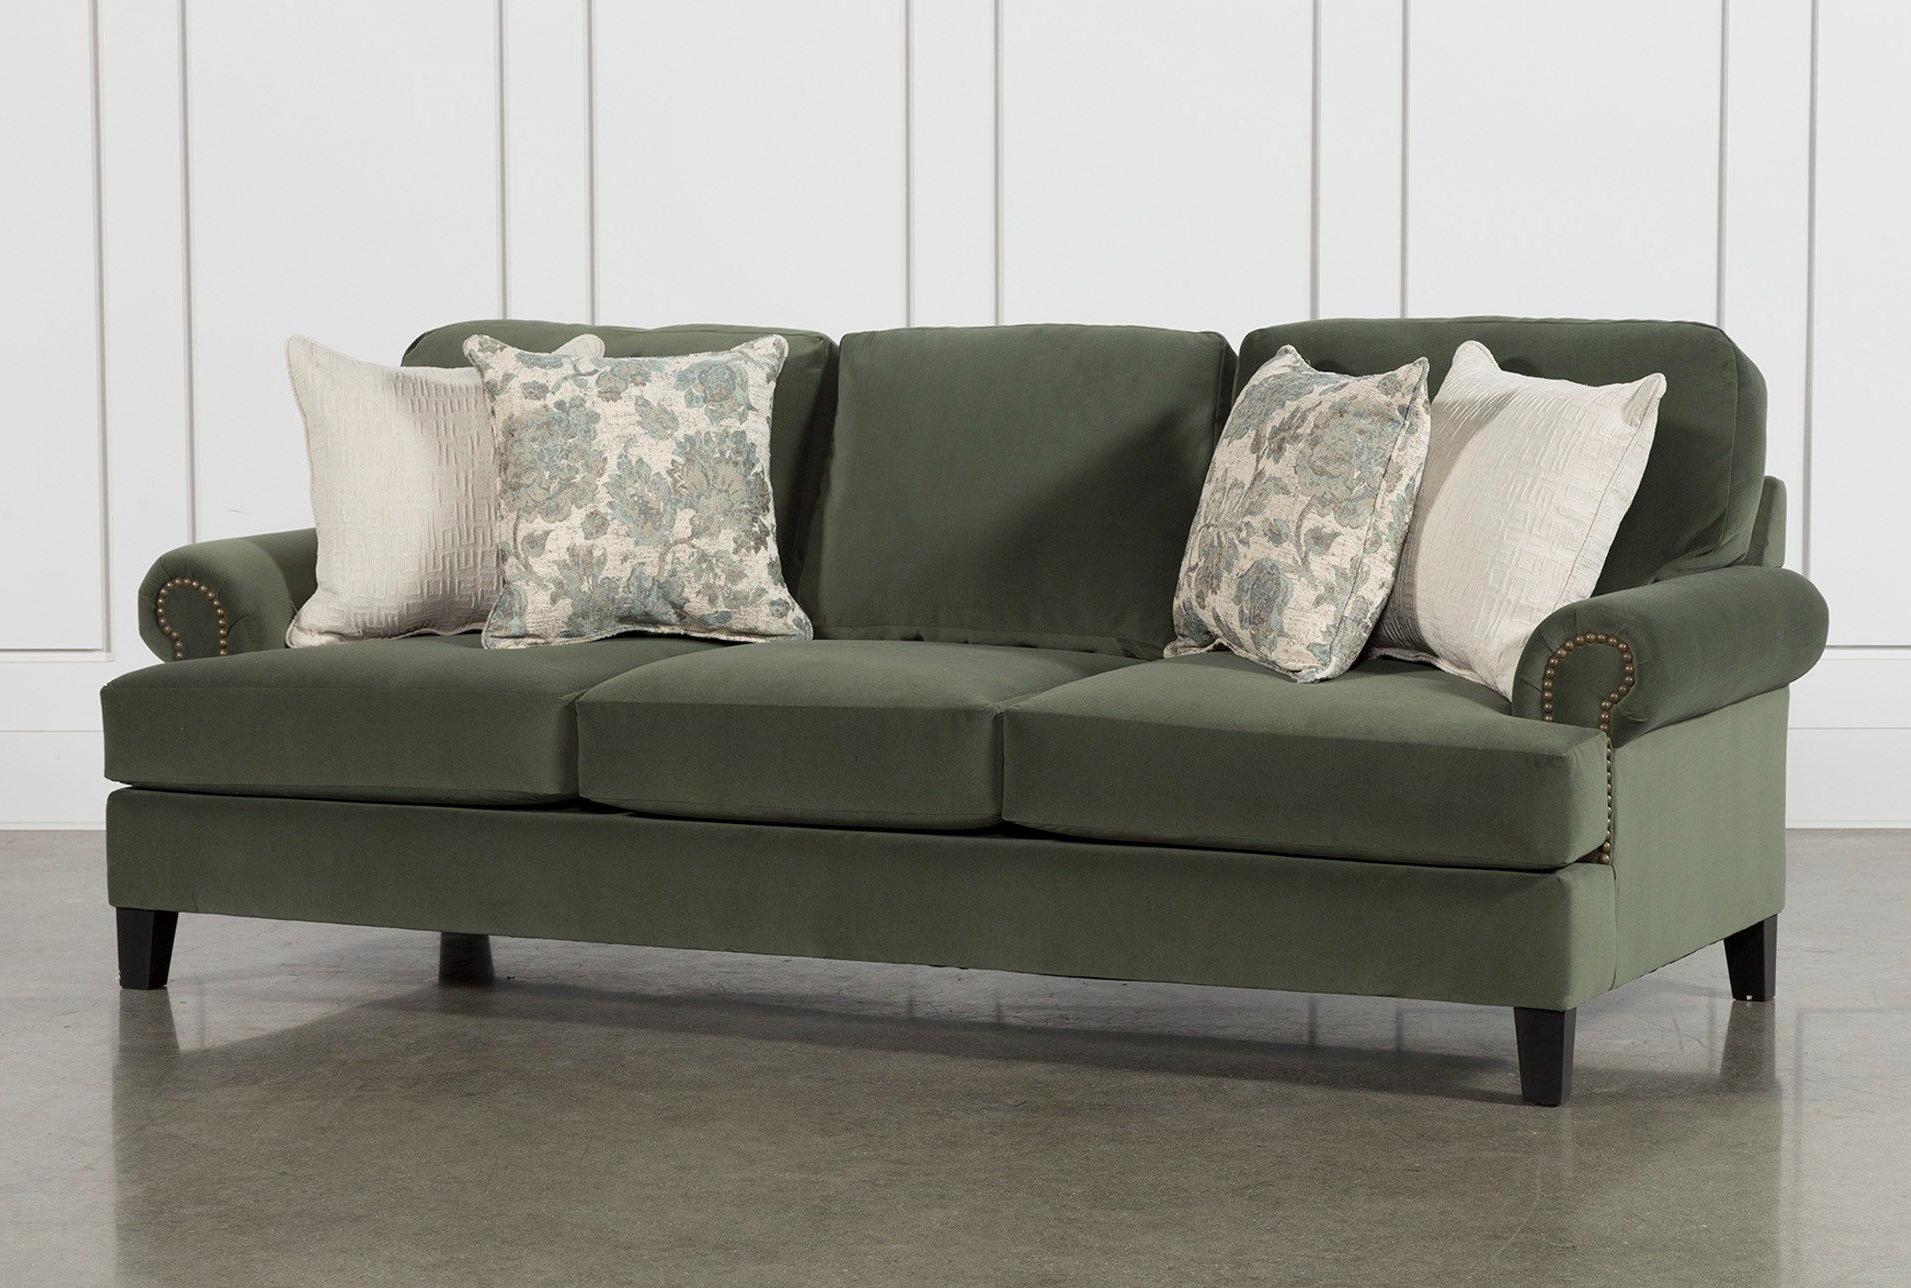 Furniture, Storage, & Lighting (View 14 of 20)